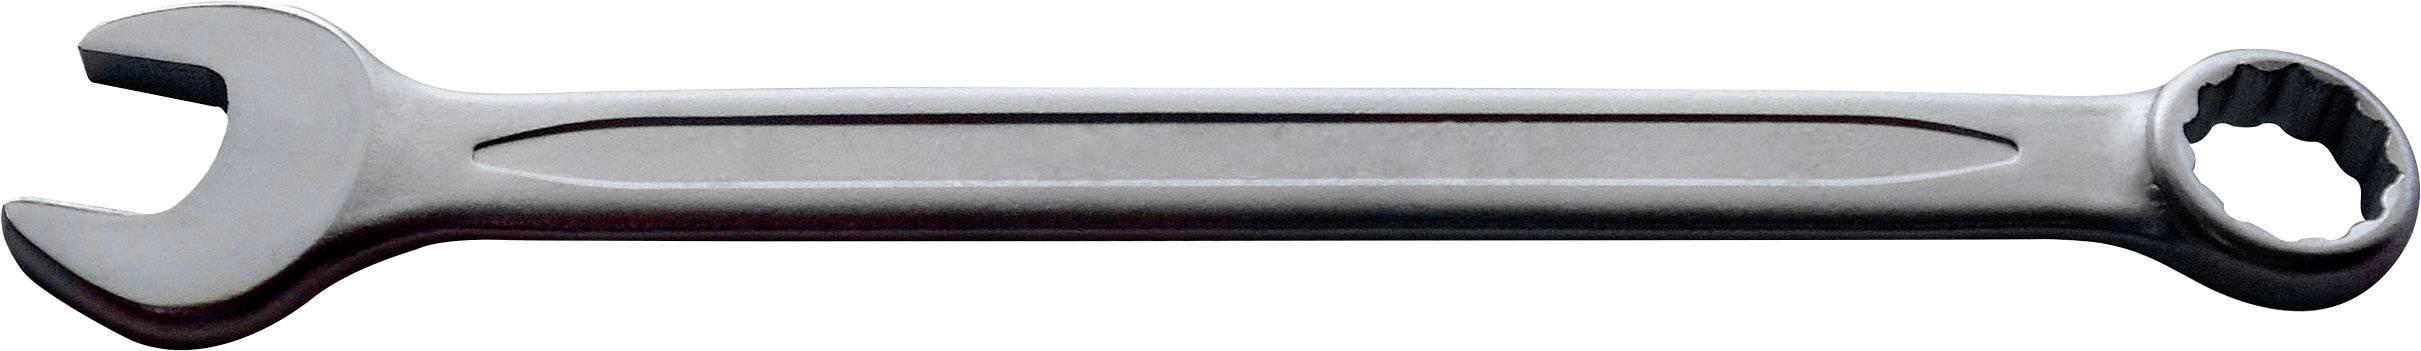 Očkoplochý klíč TOOLCRAFT 820836, N/A, 13 mm